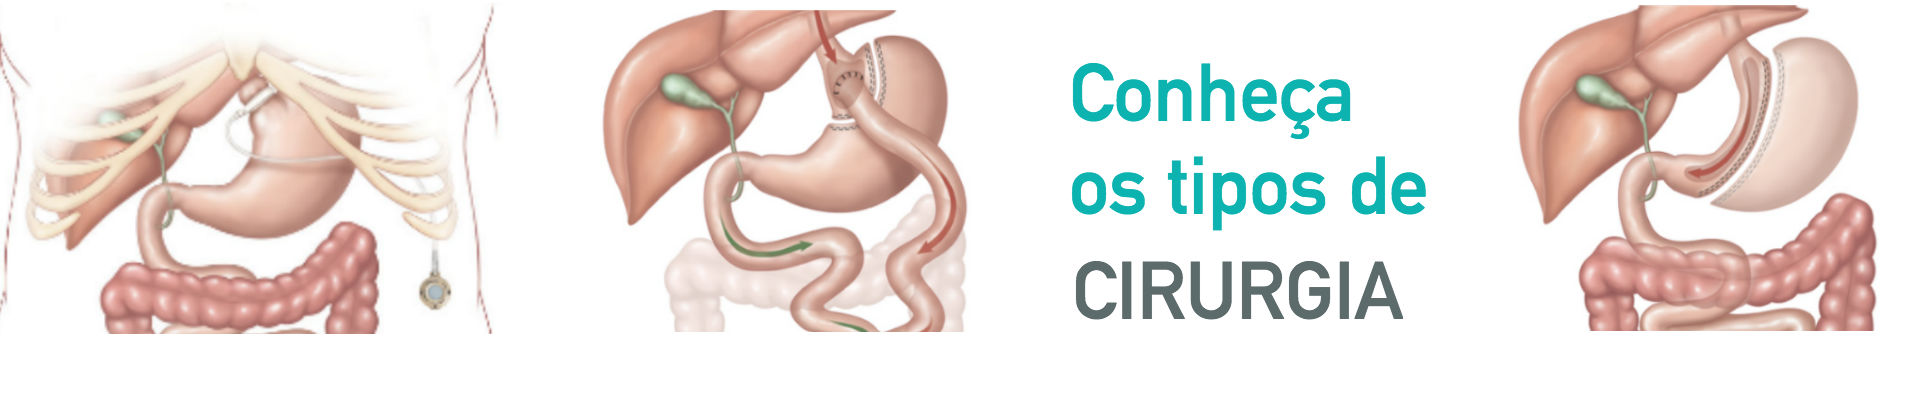 http://cirurgiadeobesidade.med.br/wp-content/uploads/2015/11/Banner-02-aprovado.jpg